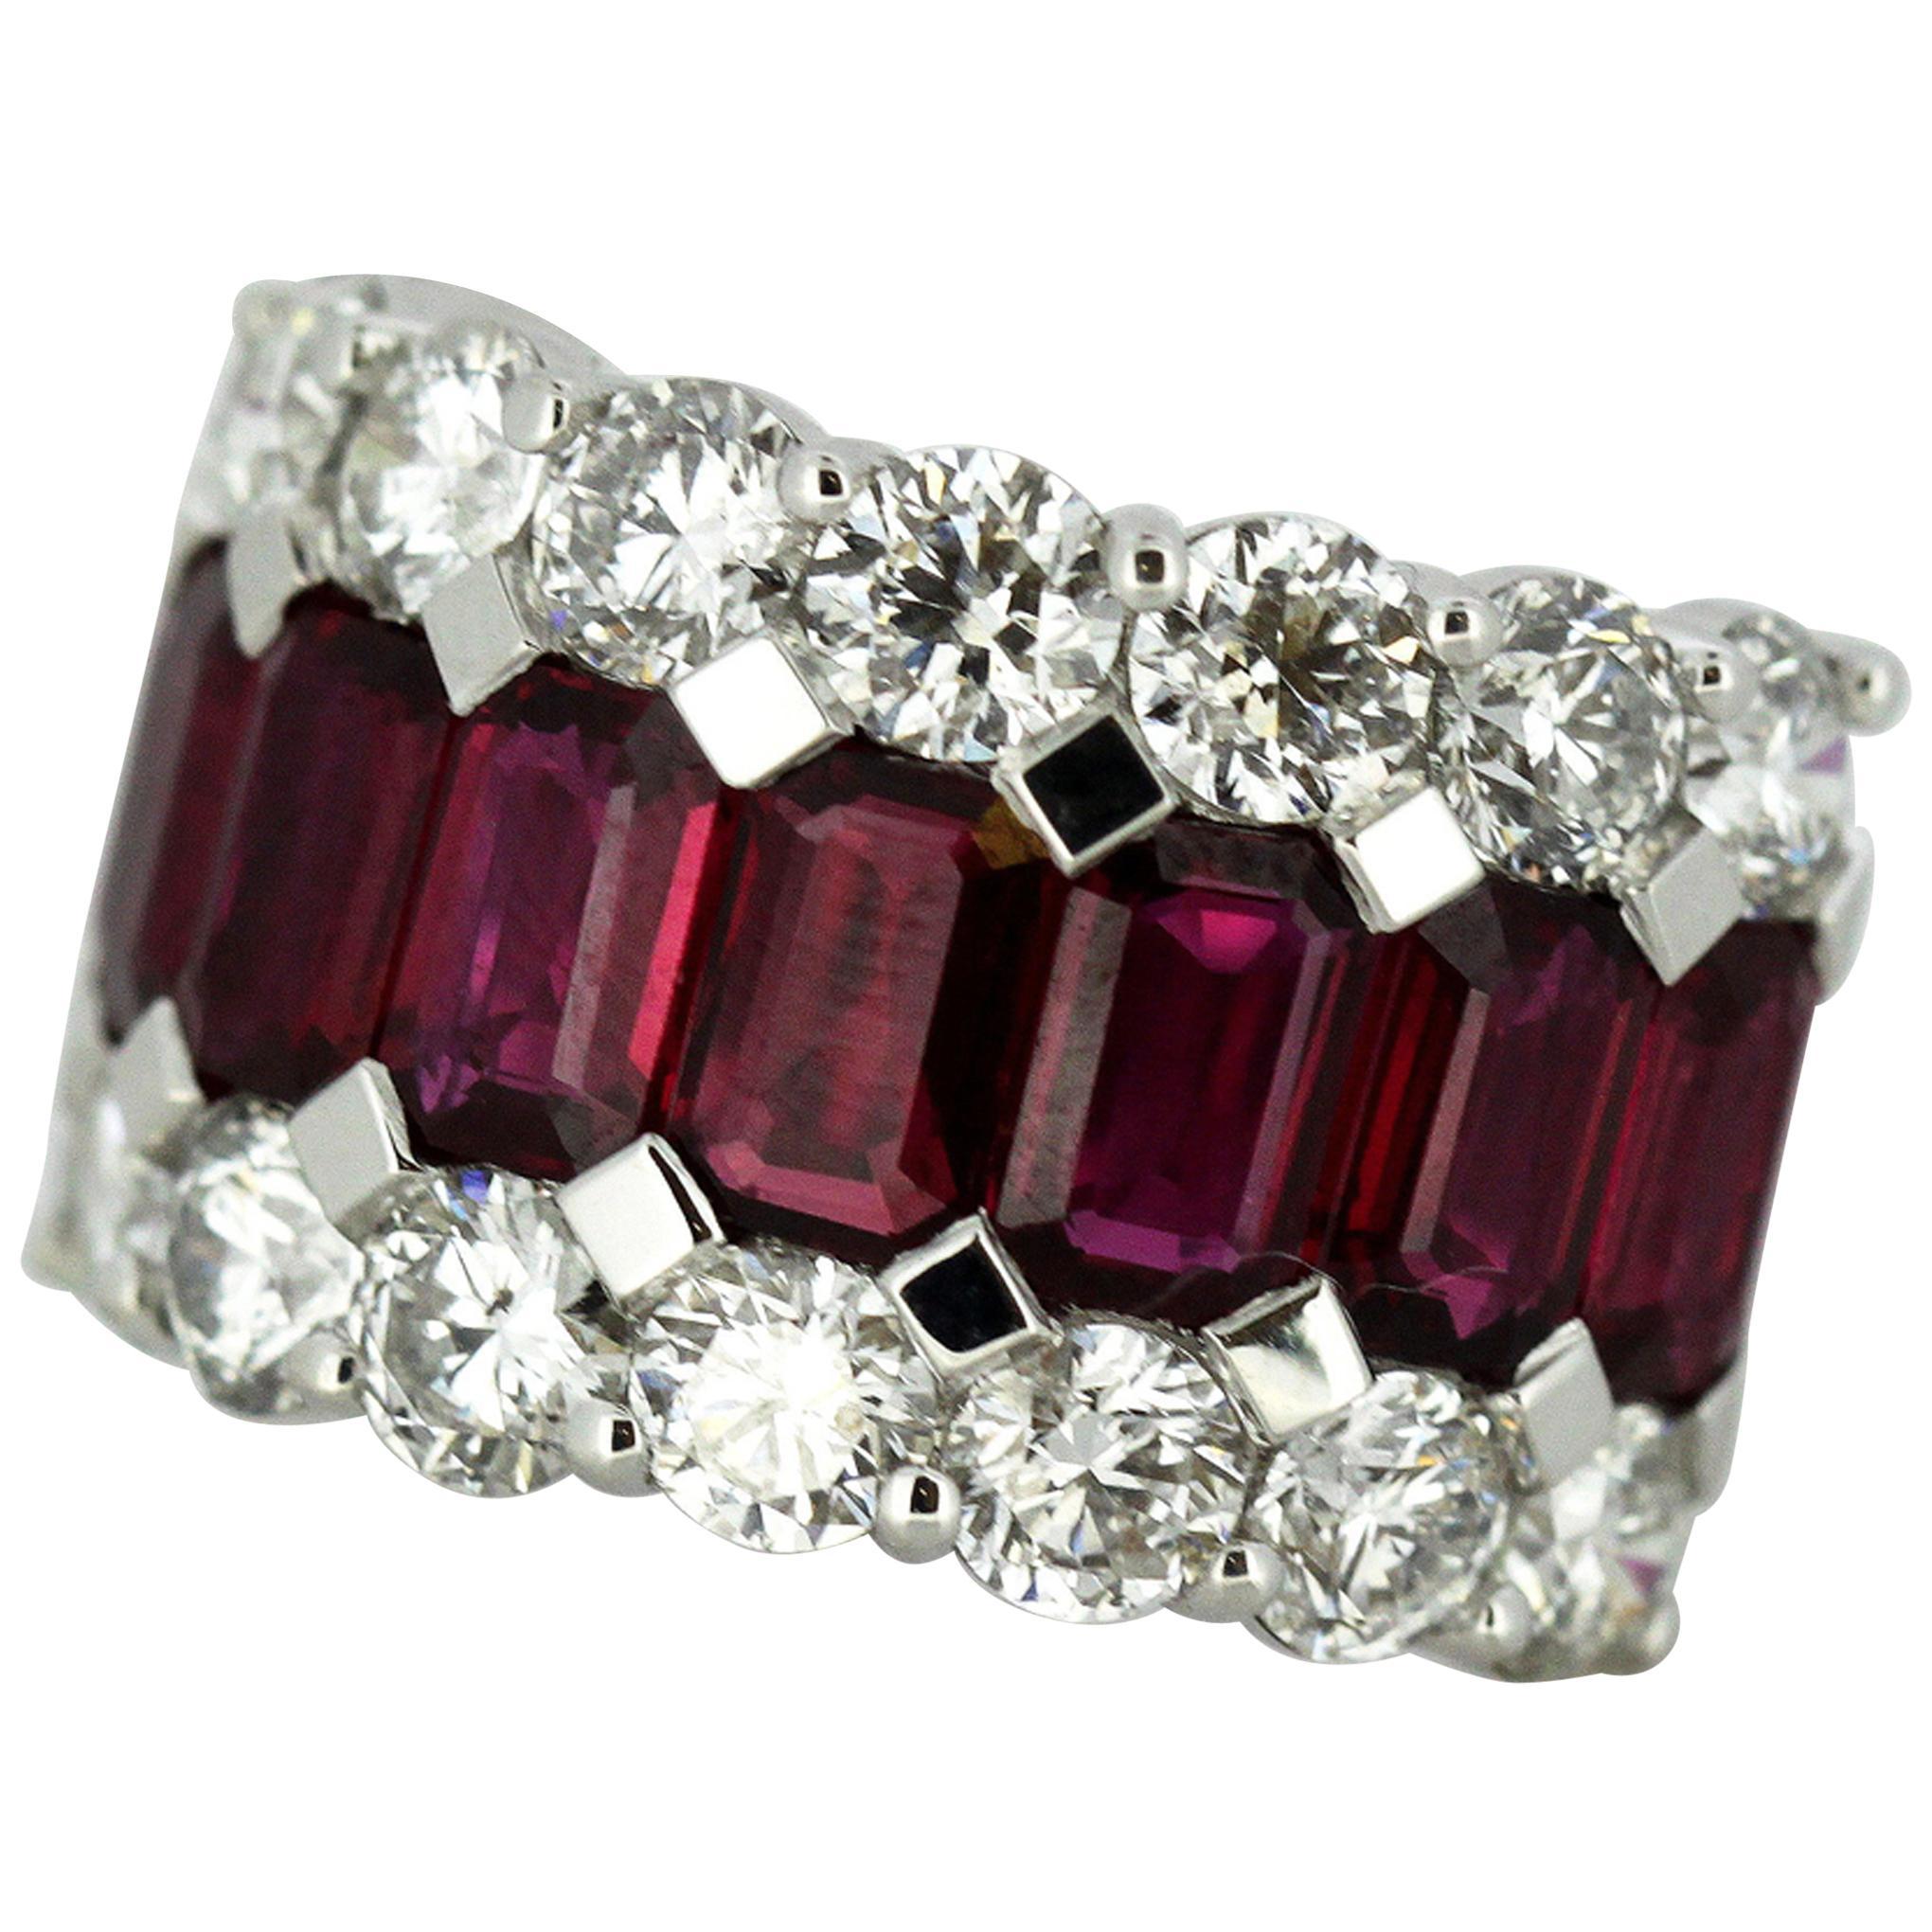 18 Karat Gold Ladies Half Eternity Ring with Natural Burmese Rubies and Diamonds